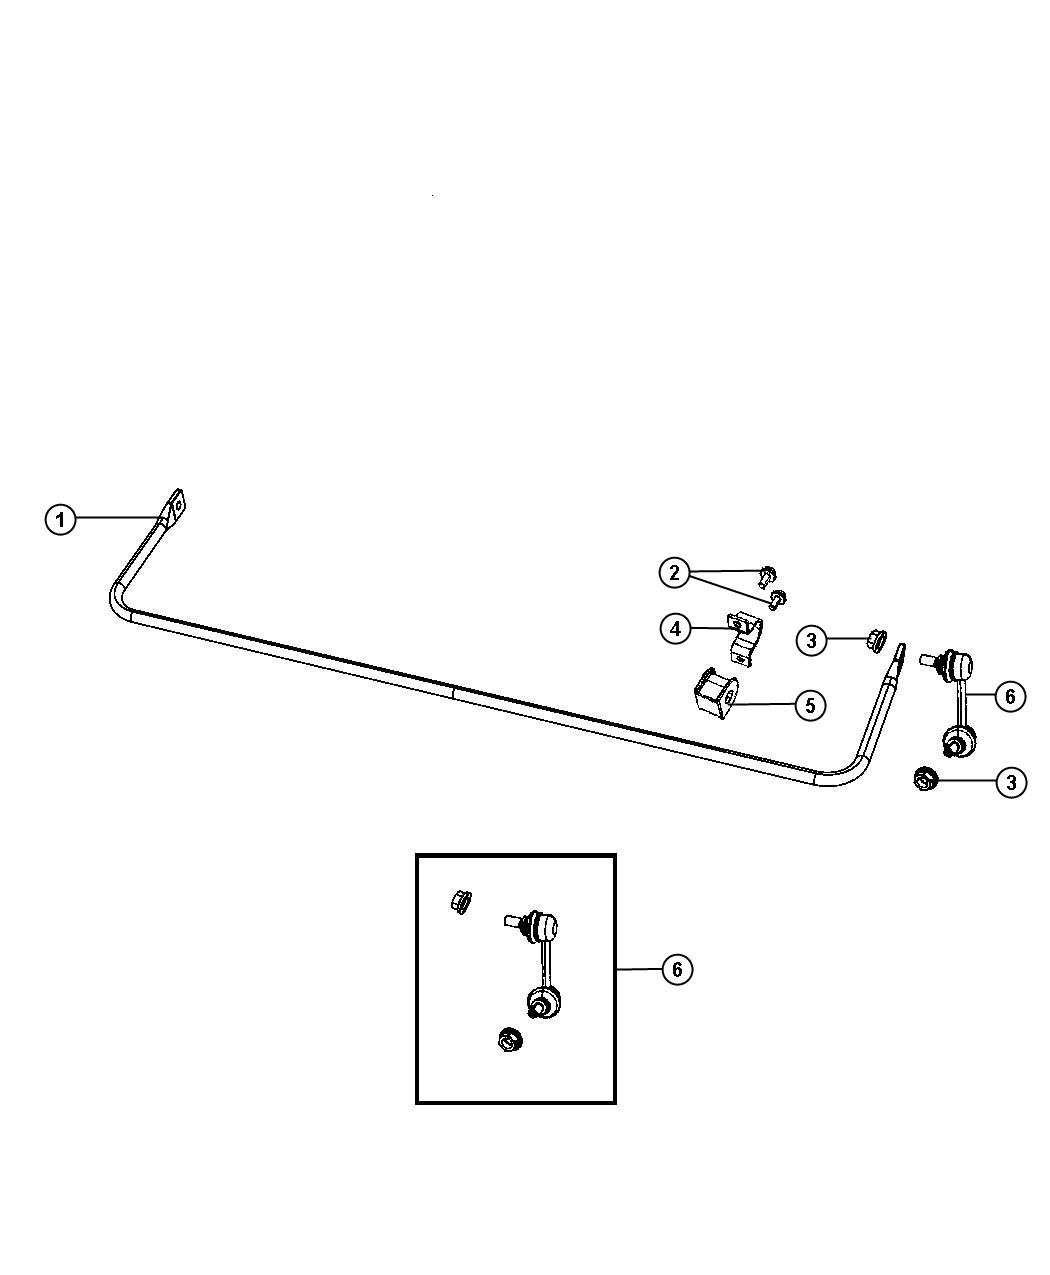 Dodge Caliber Stabilizer Bar Rear Suspension Sdc